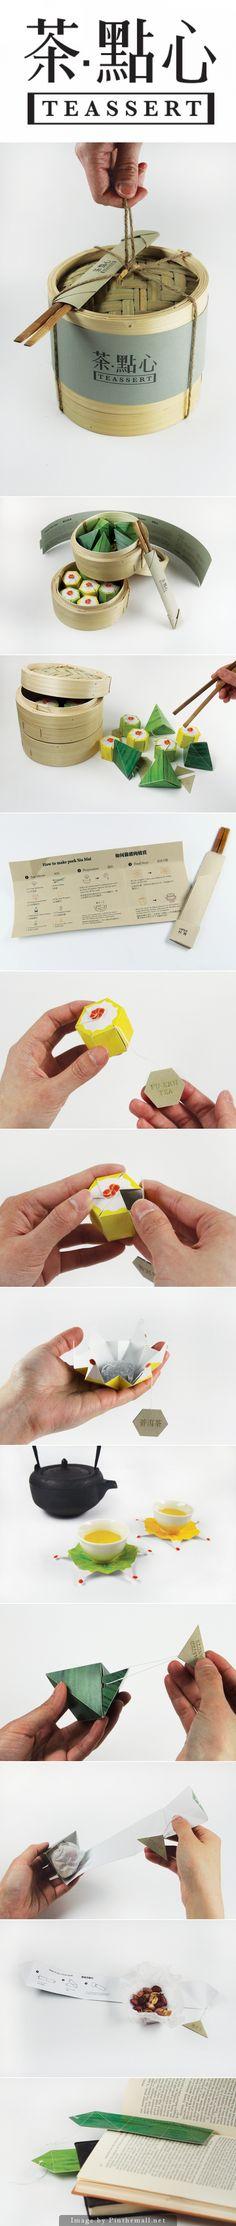 Too pretty not to share the entire Teassert #packaging pin PD - created via https://www.behance.net/gallery/Teassert/15883085